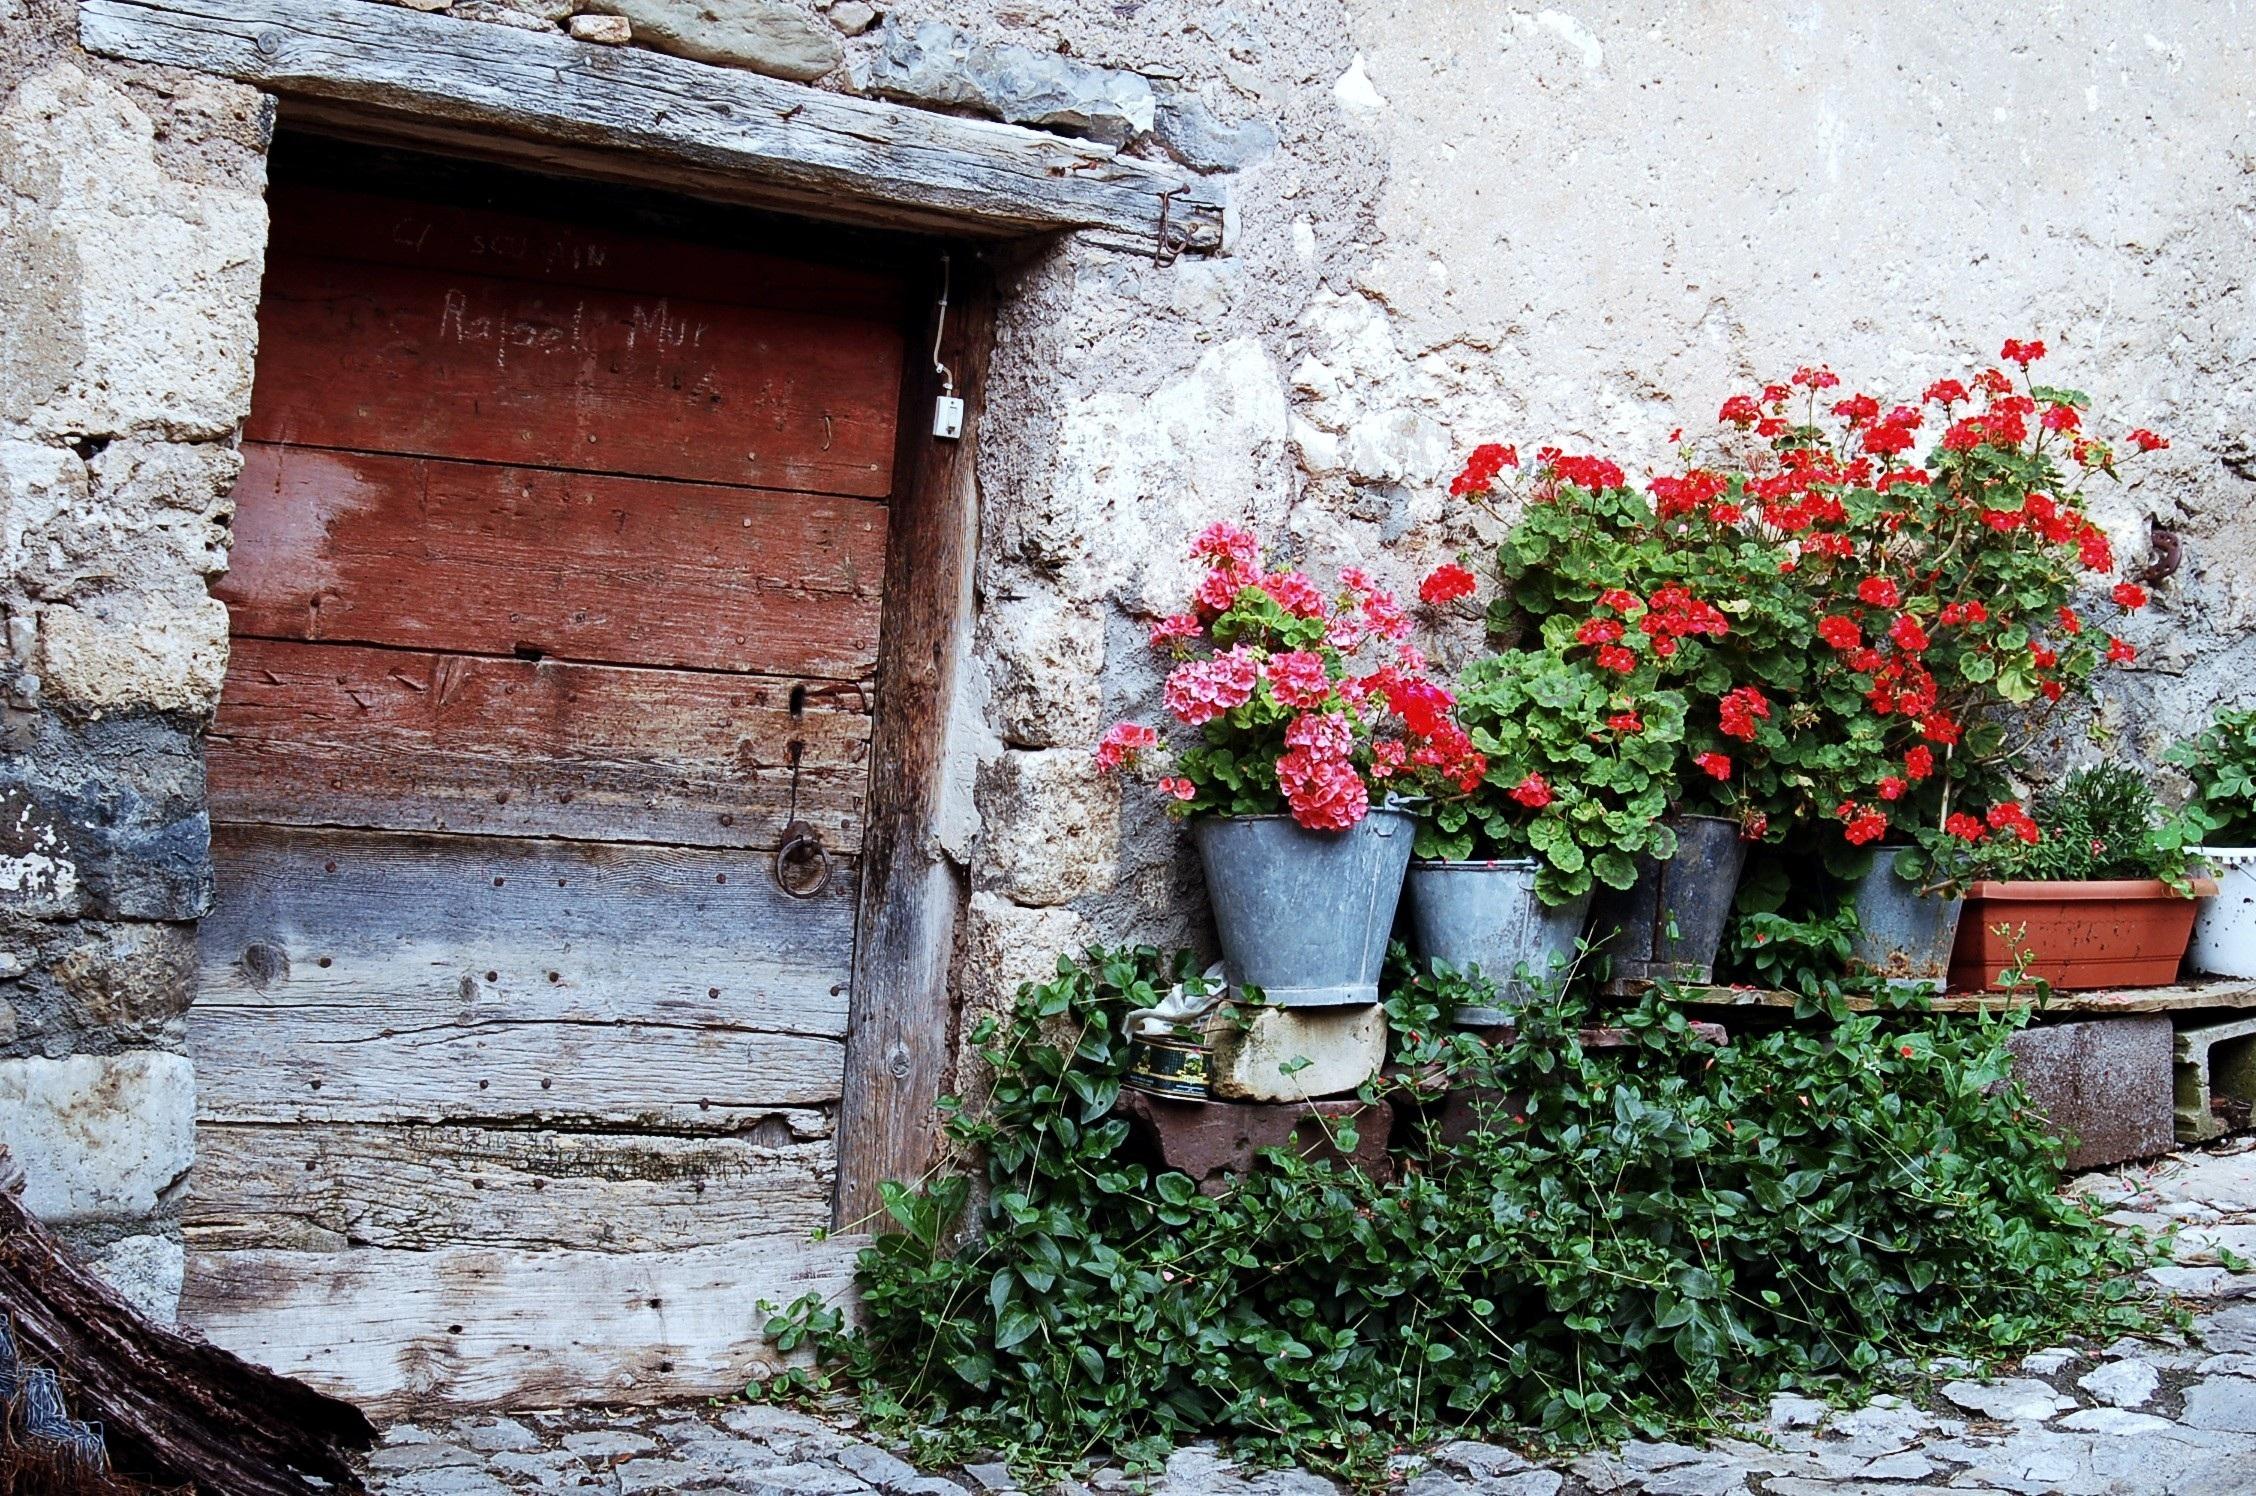 Fotos Gratis Arquitectura Planta Palacio Flor Ventana Antiguo